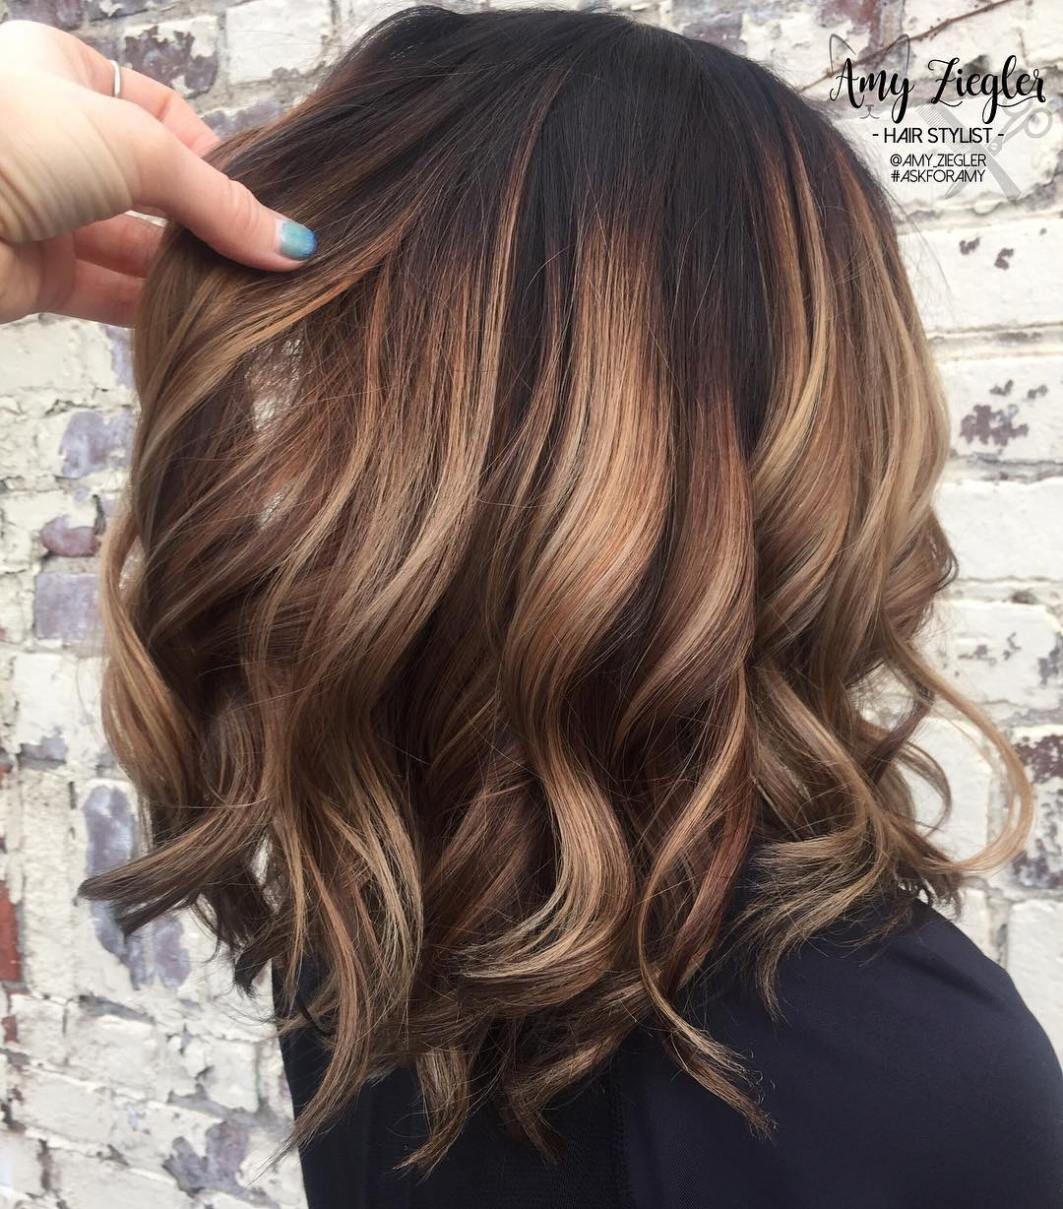 Caramel Balayage Hair With Black Roots